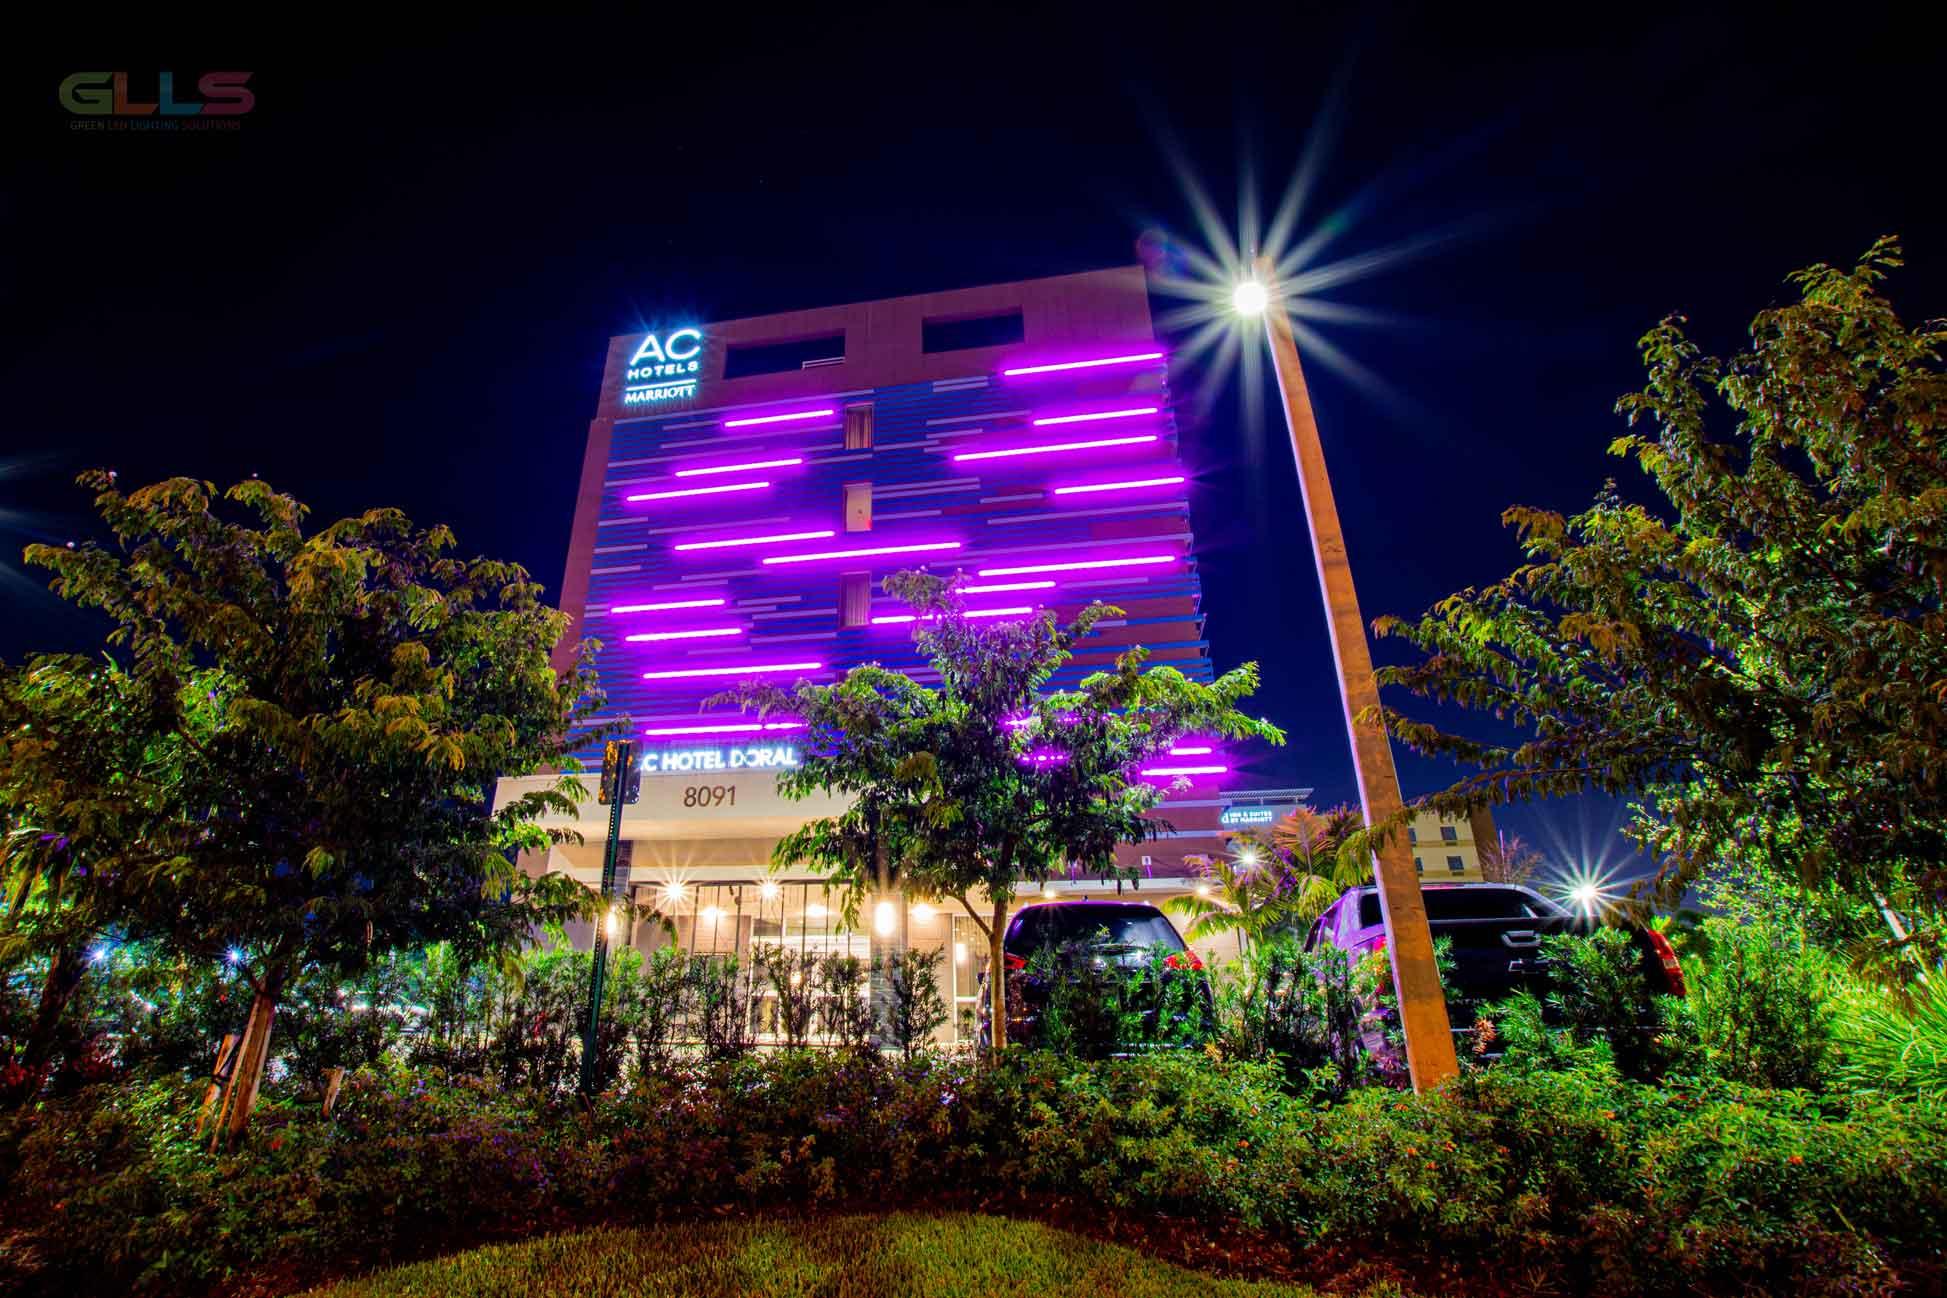 AC-Hotel-Aventura-Florida18